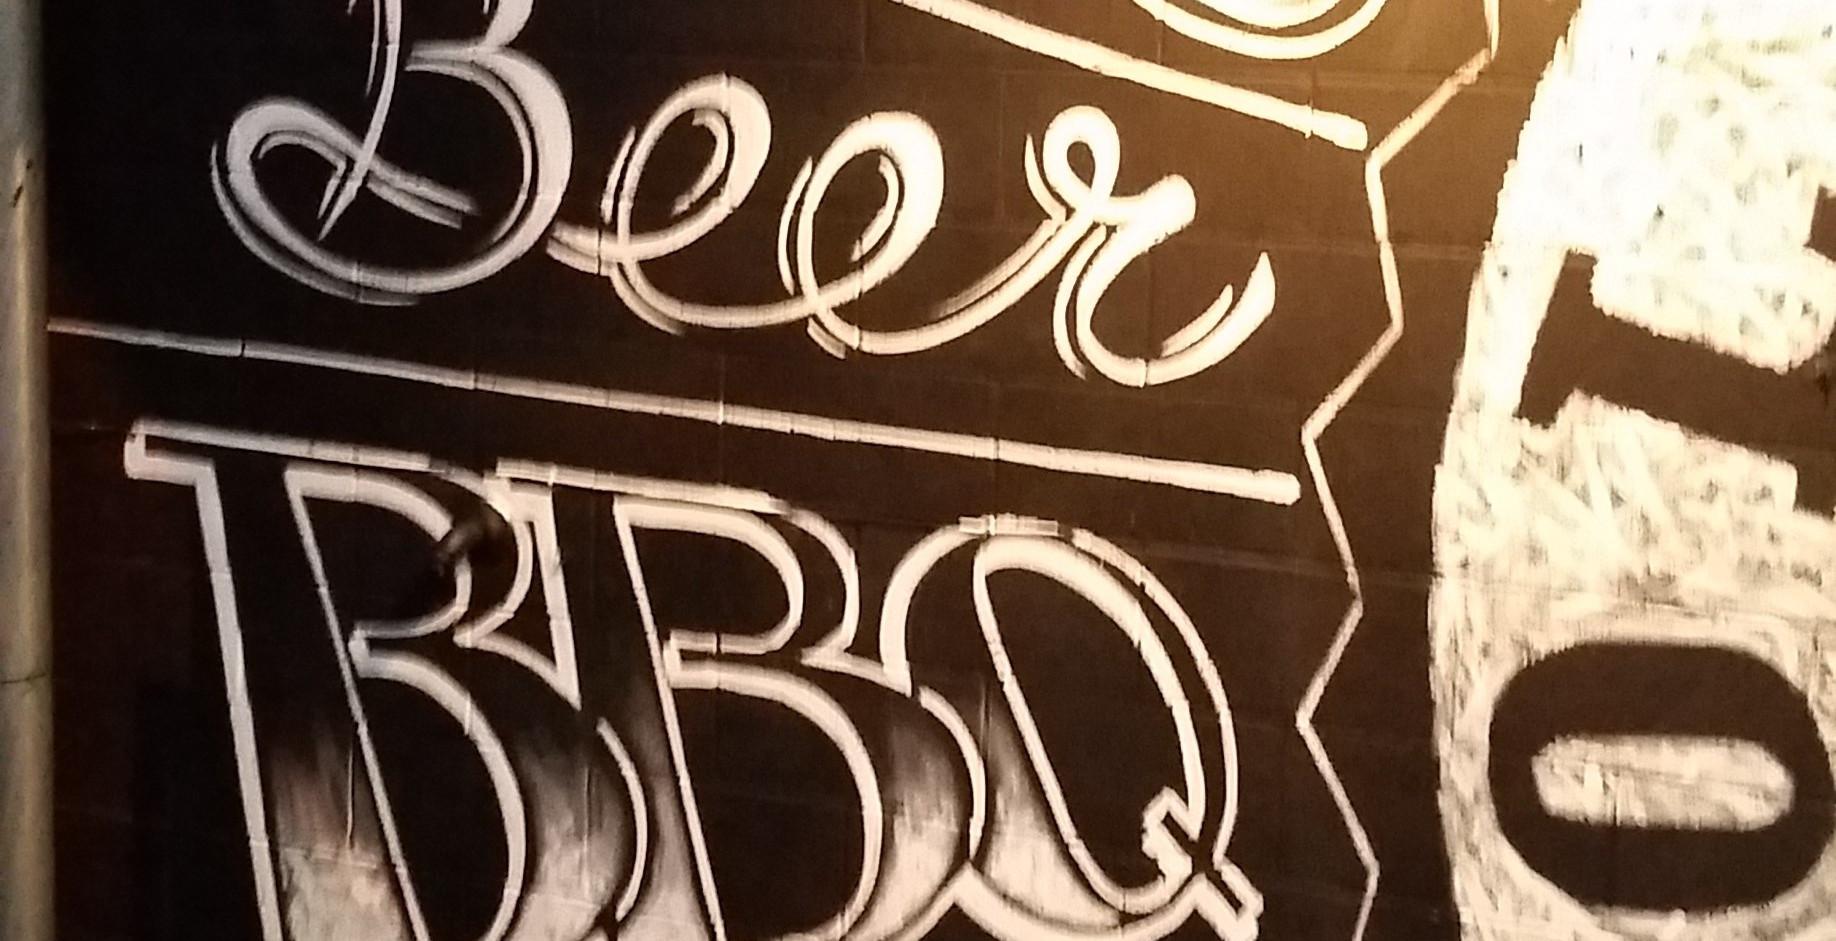 BOOTS - Beer - BBQ